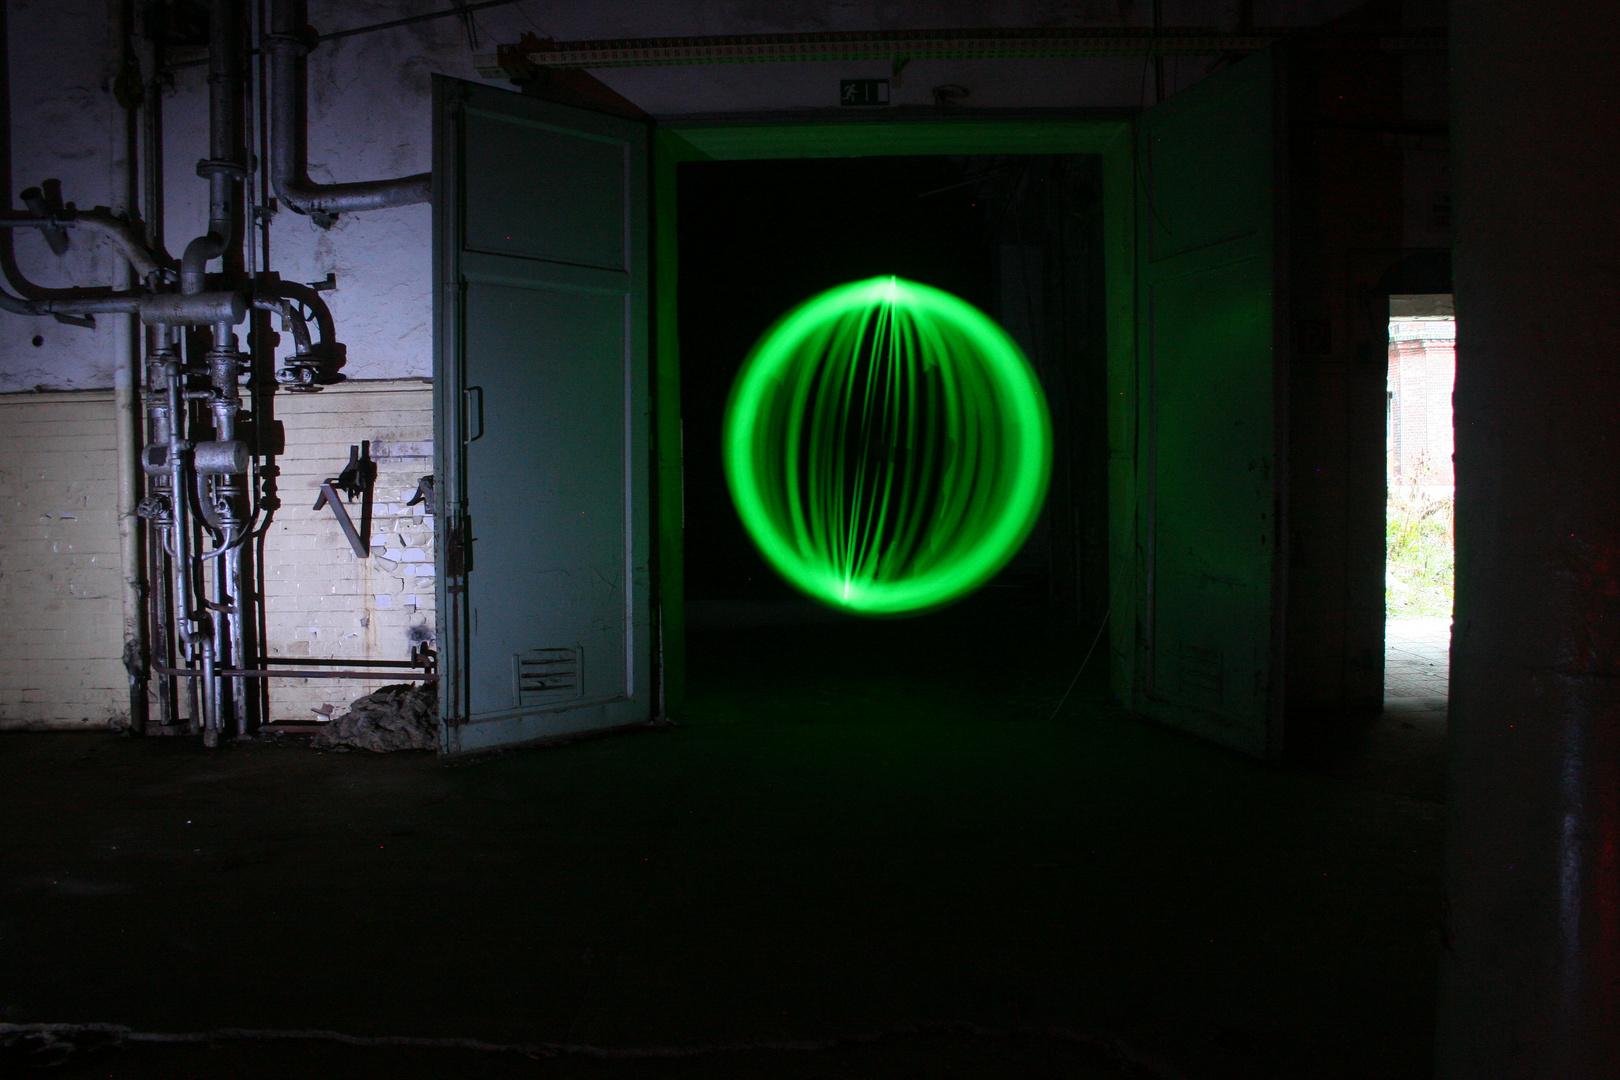 Greenglobe2